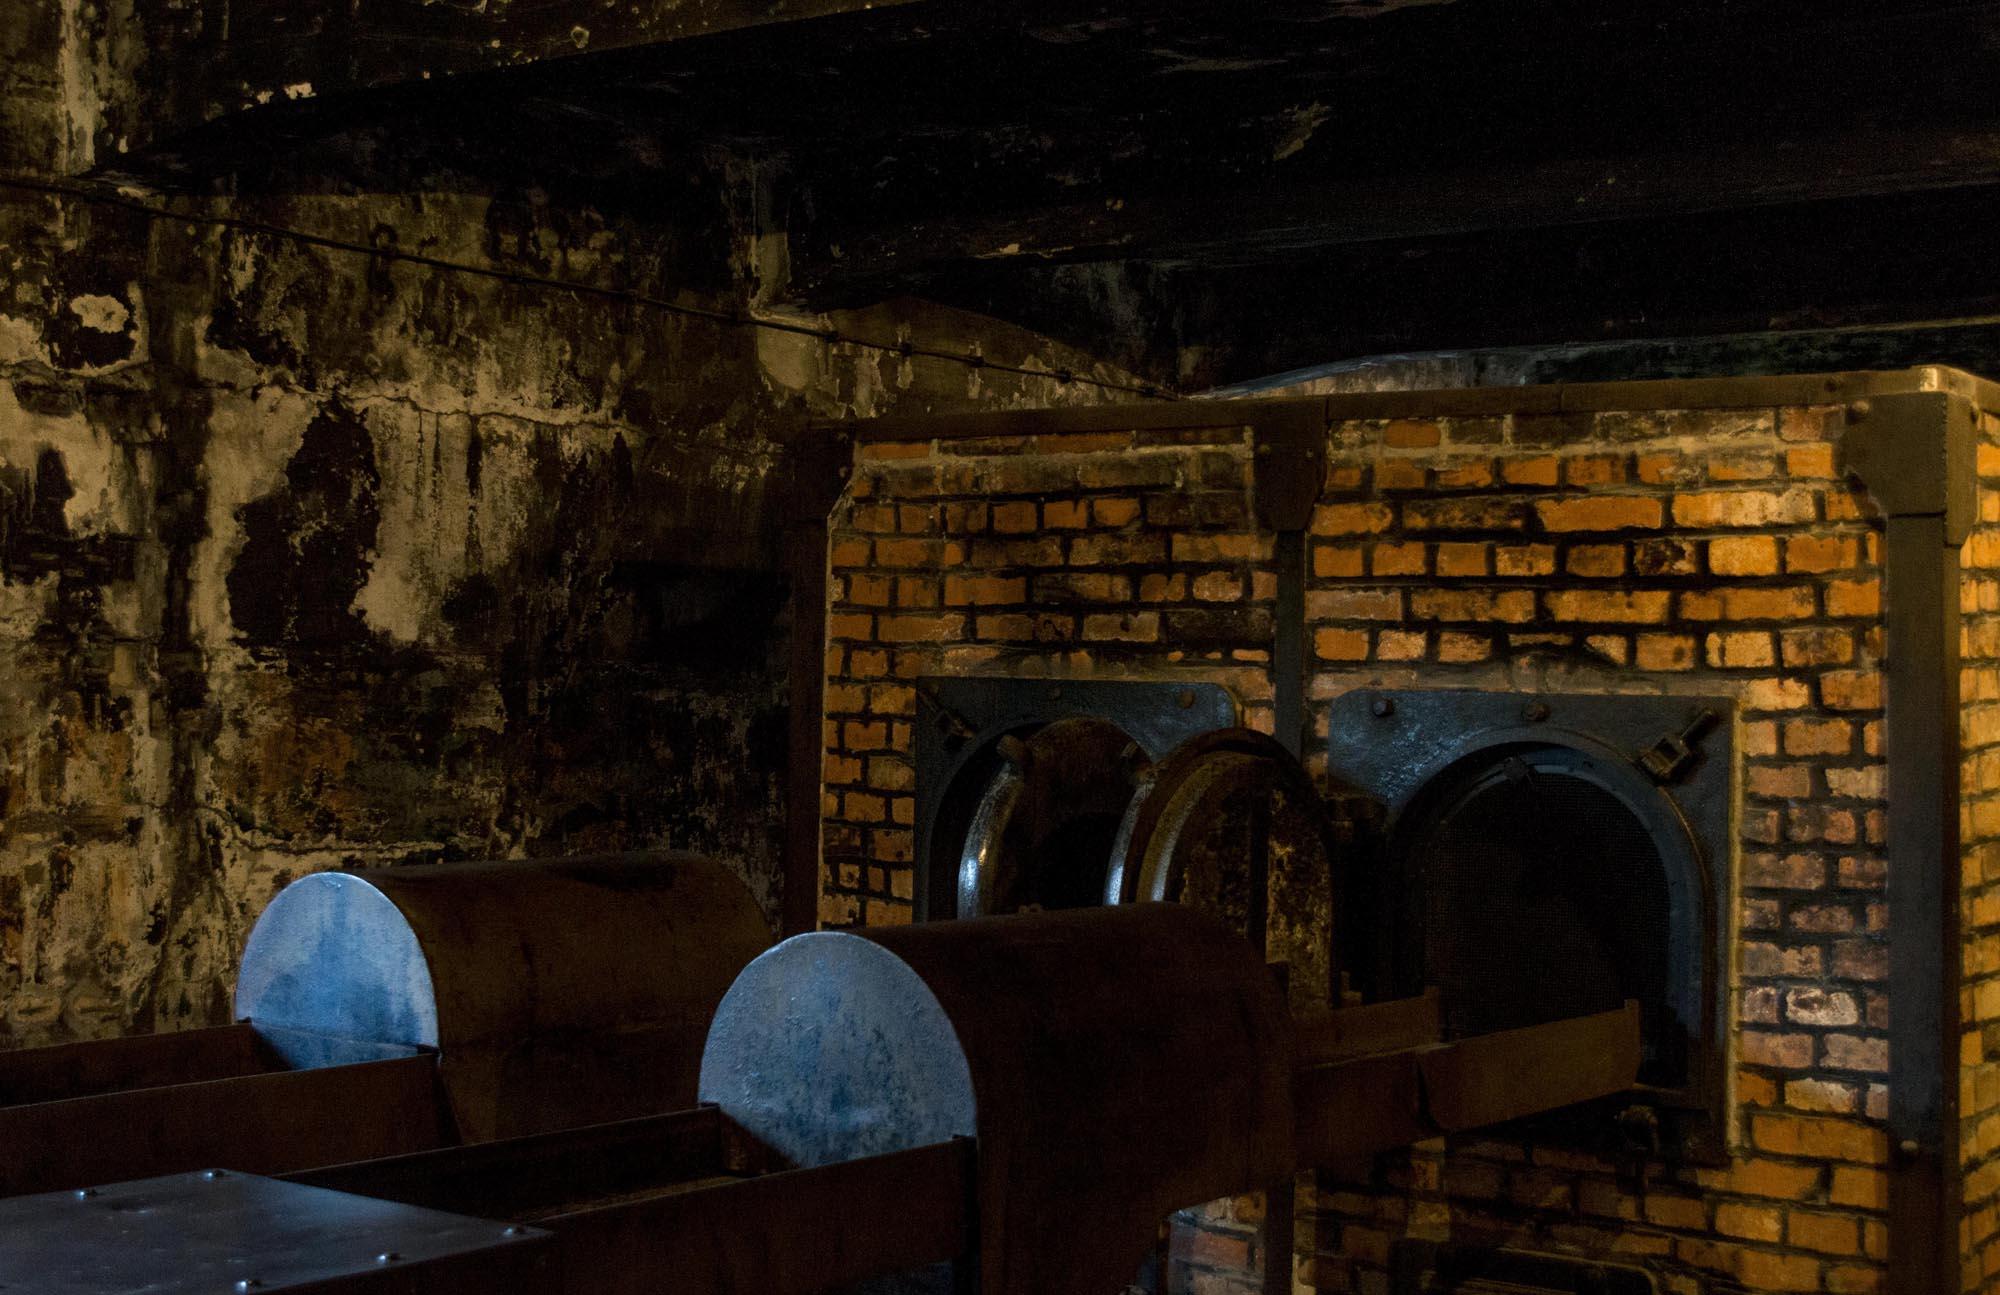 Visiting Auschwitz - crematoria